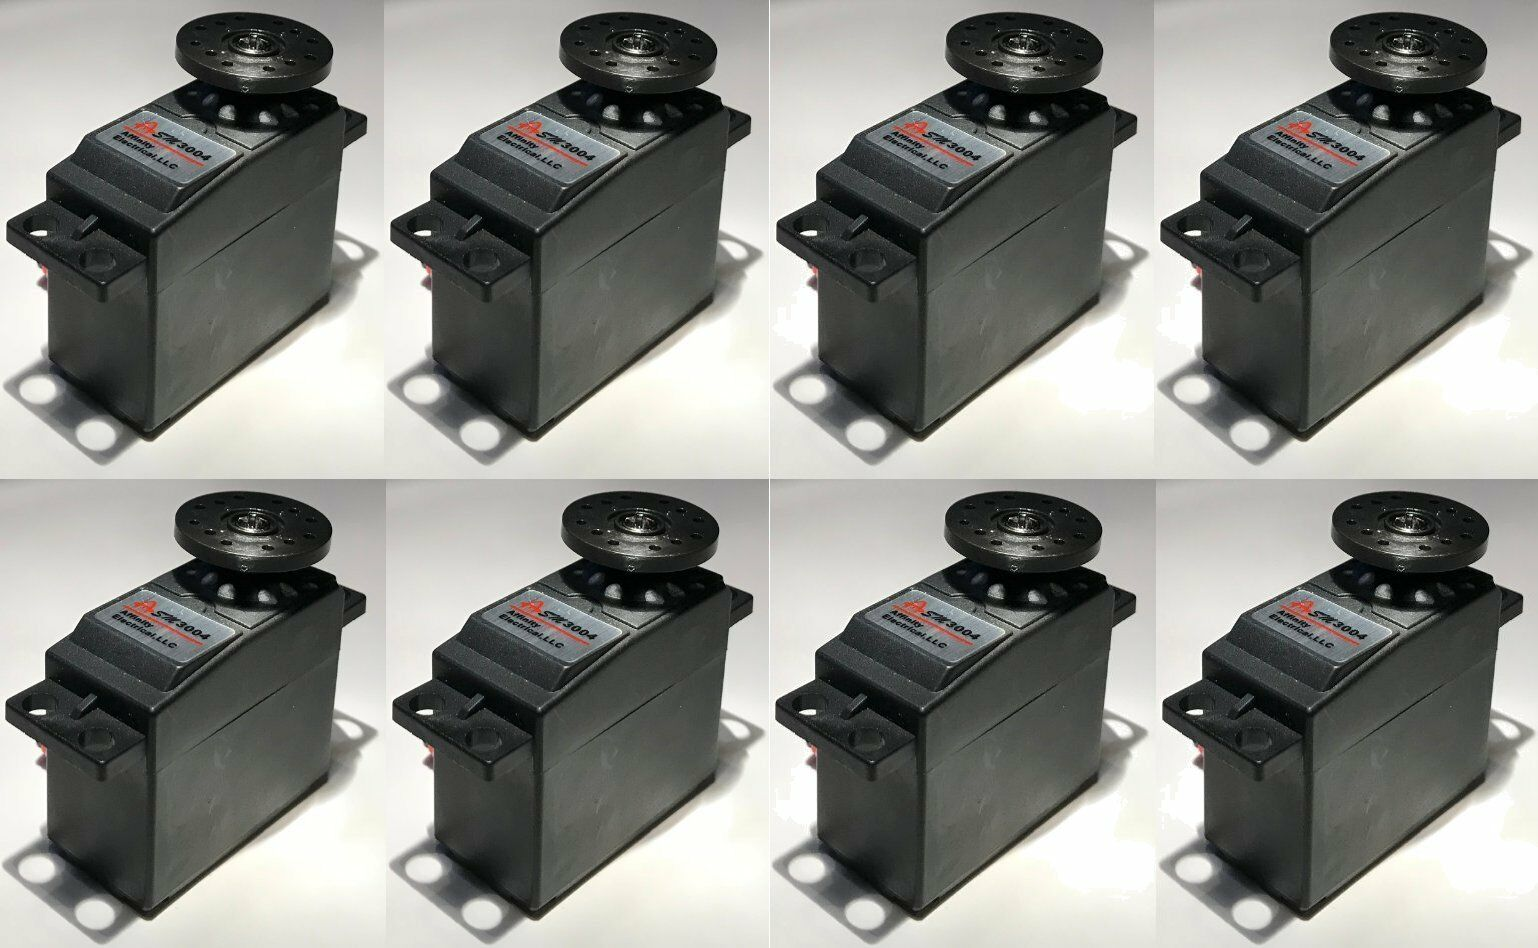 8 nyA servomotorer Futaba S3004 S3151 sim.till Hobico, Horizon Hobby, Hitec, DJI